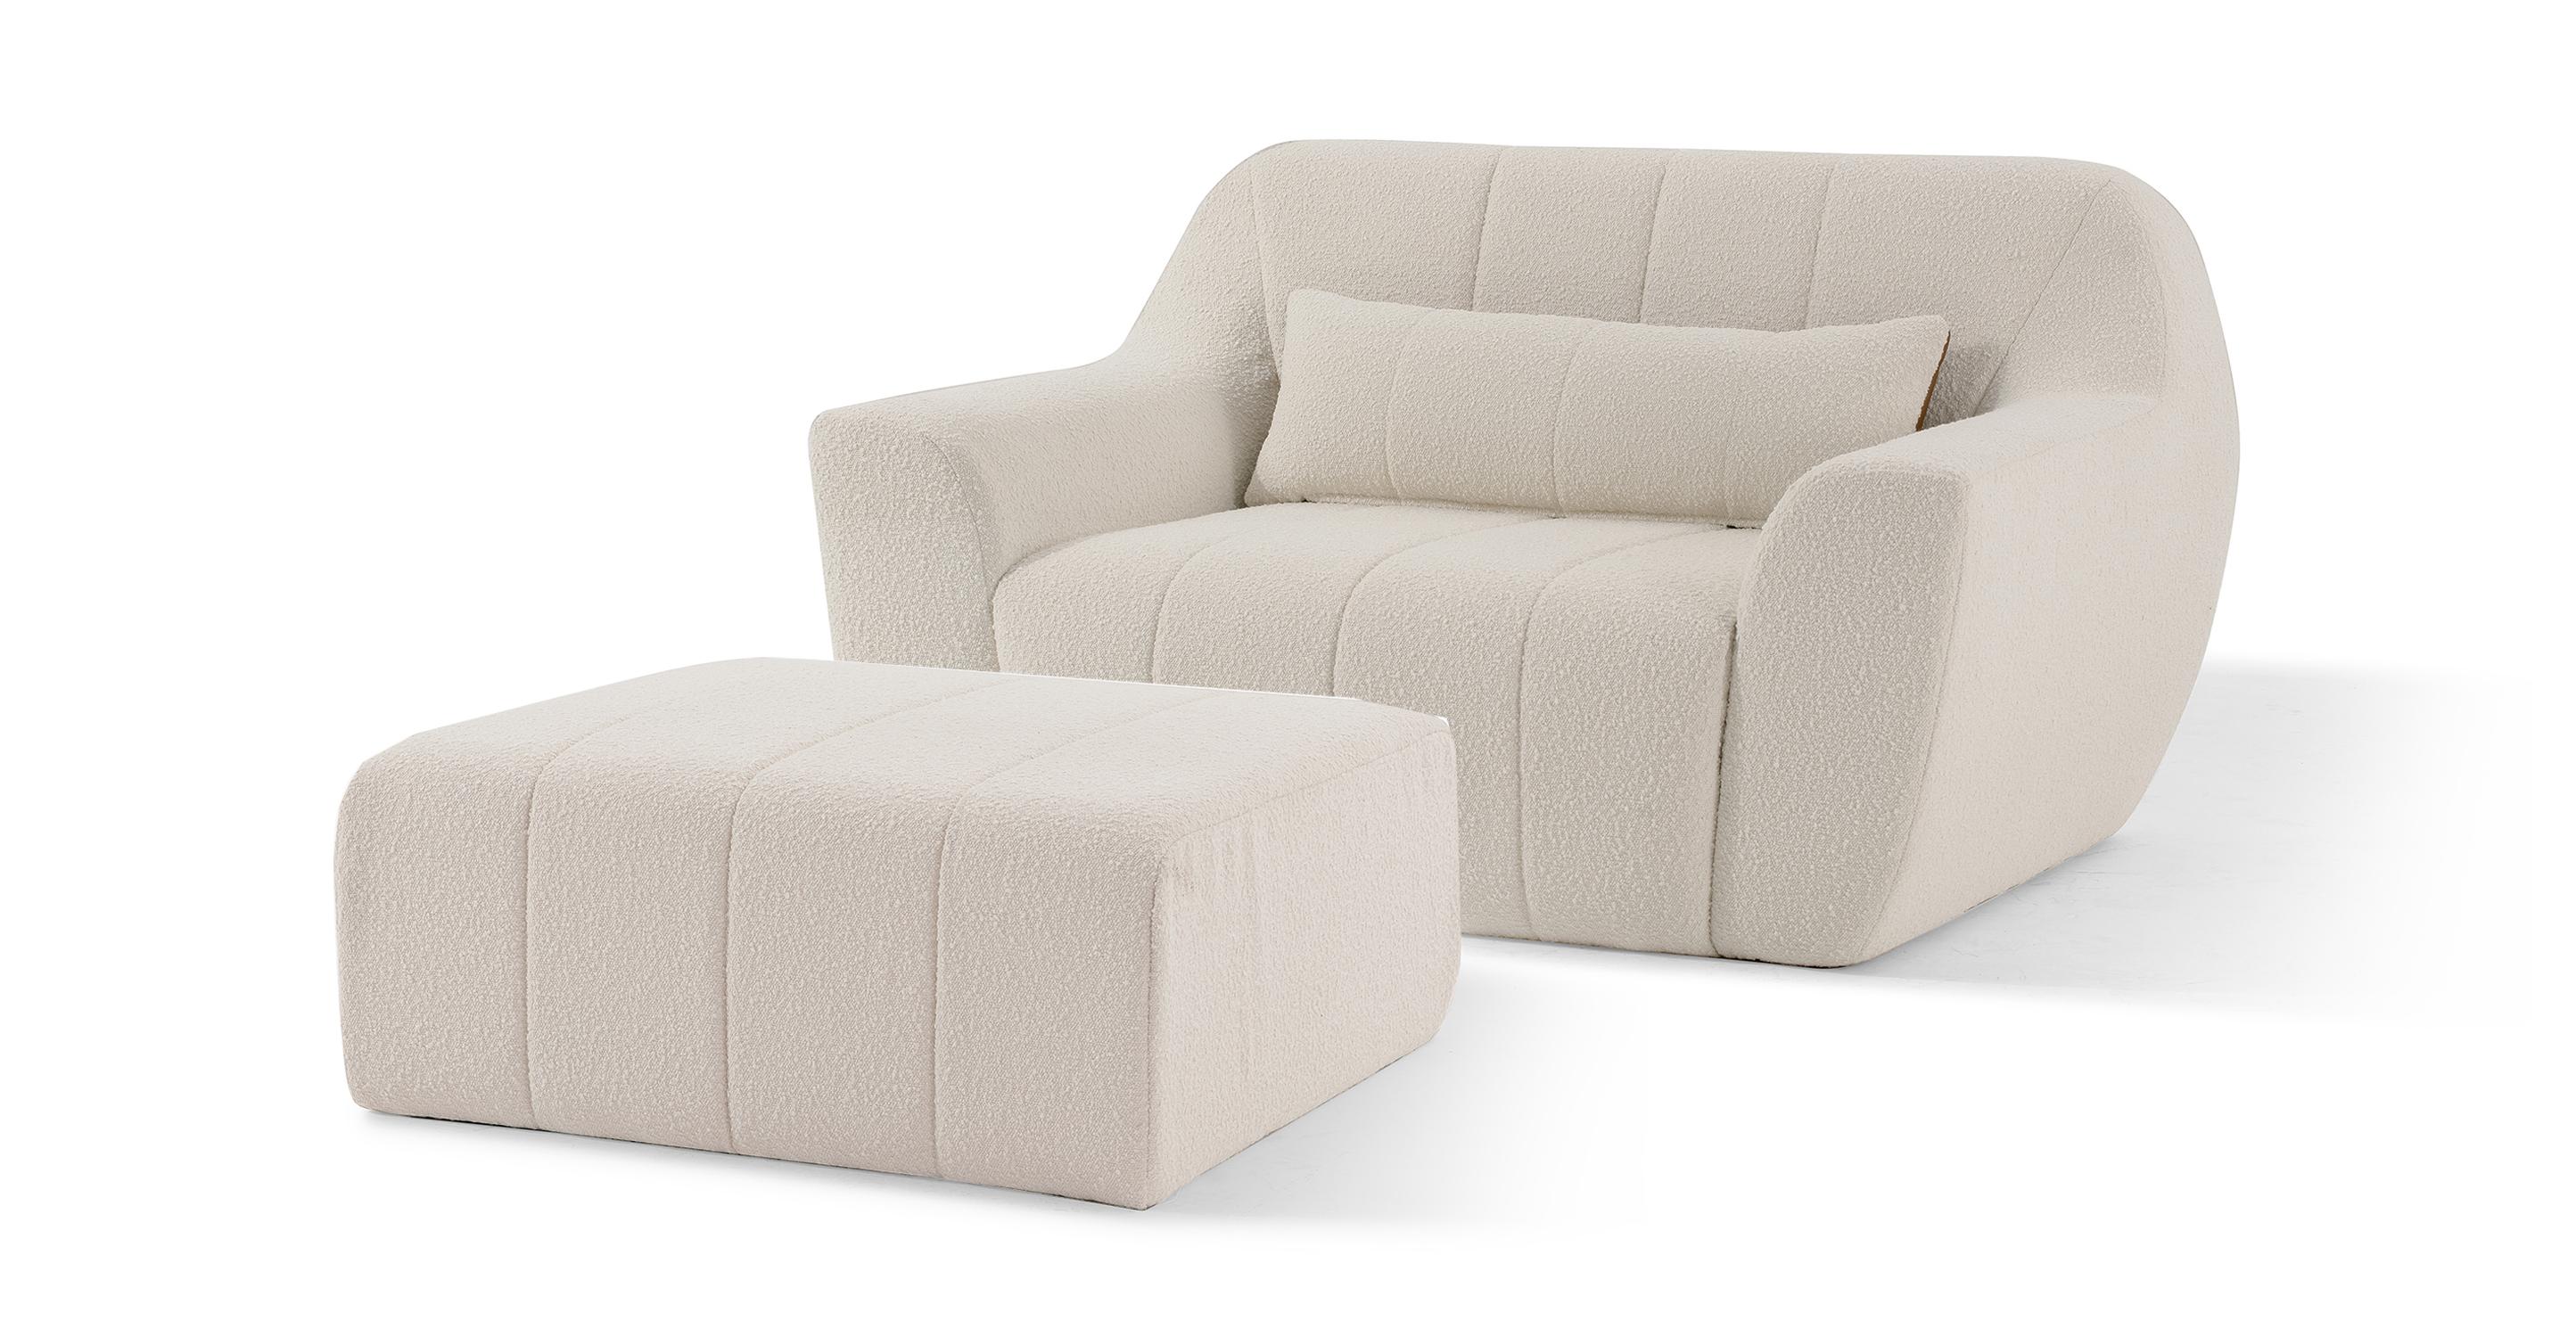 Cooper Fabric Chair & Ottoman, Blanc Boucle